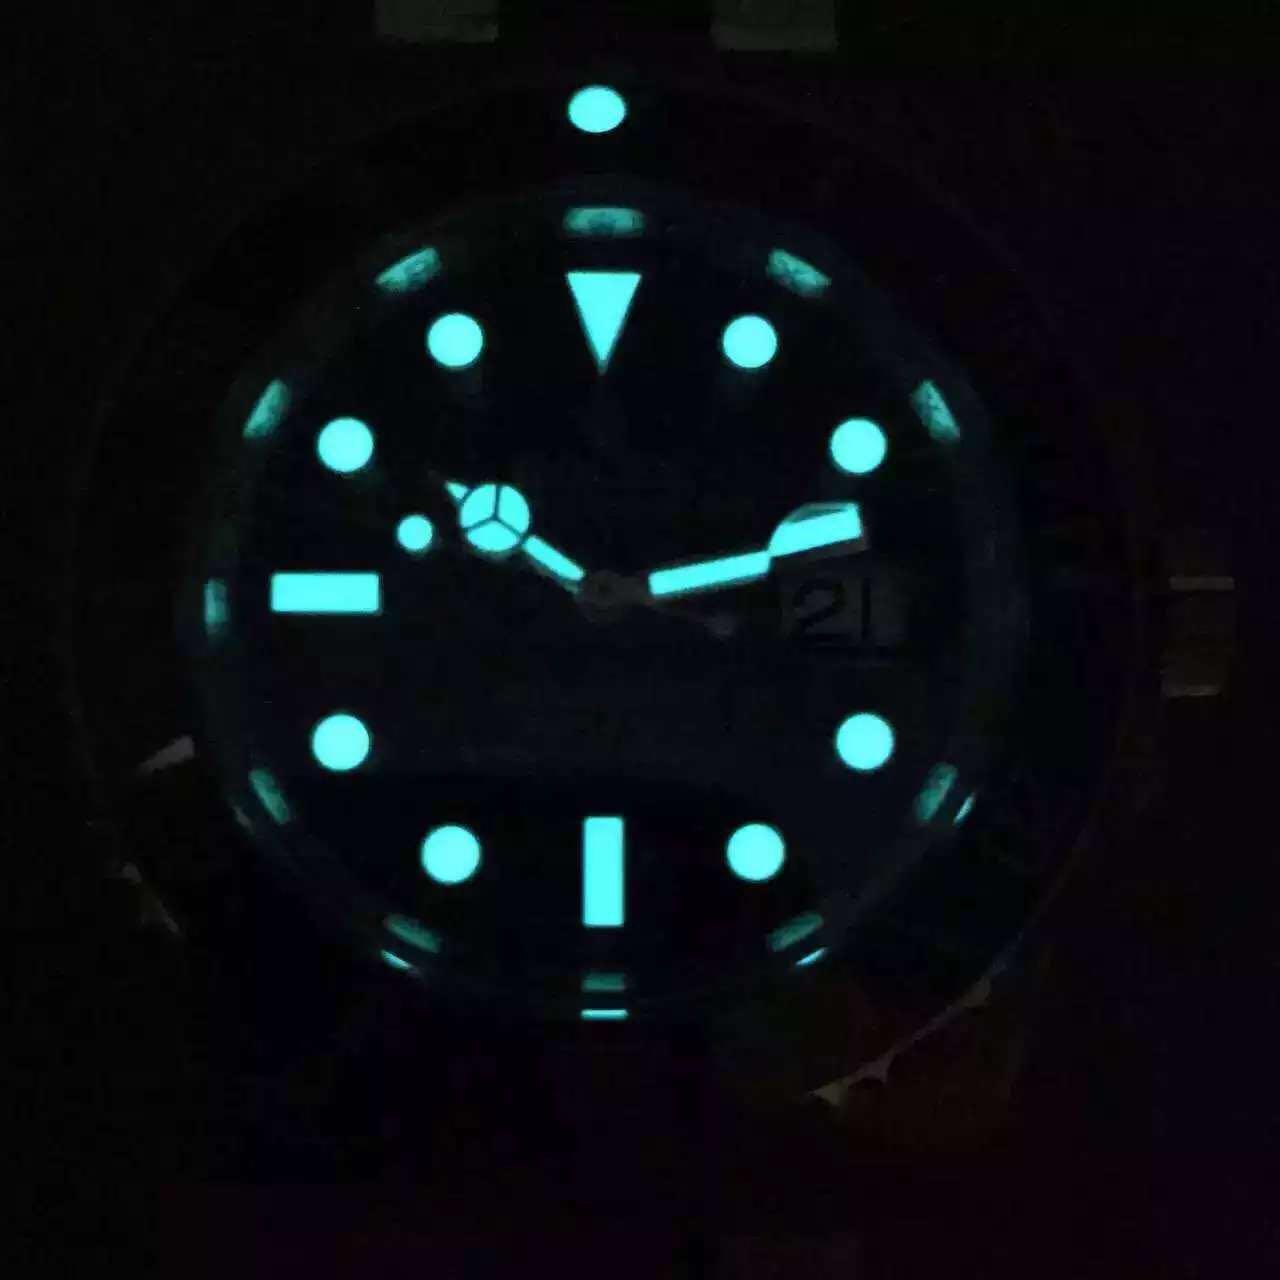 Blue Lume on 116610 LN Submariner